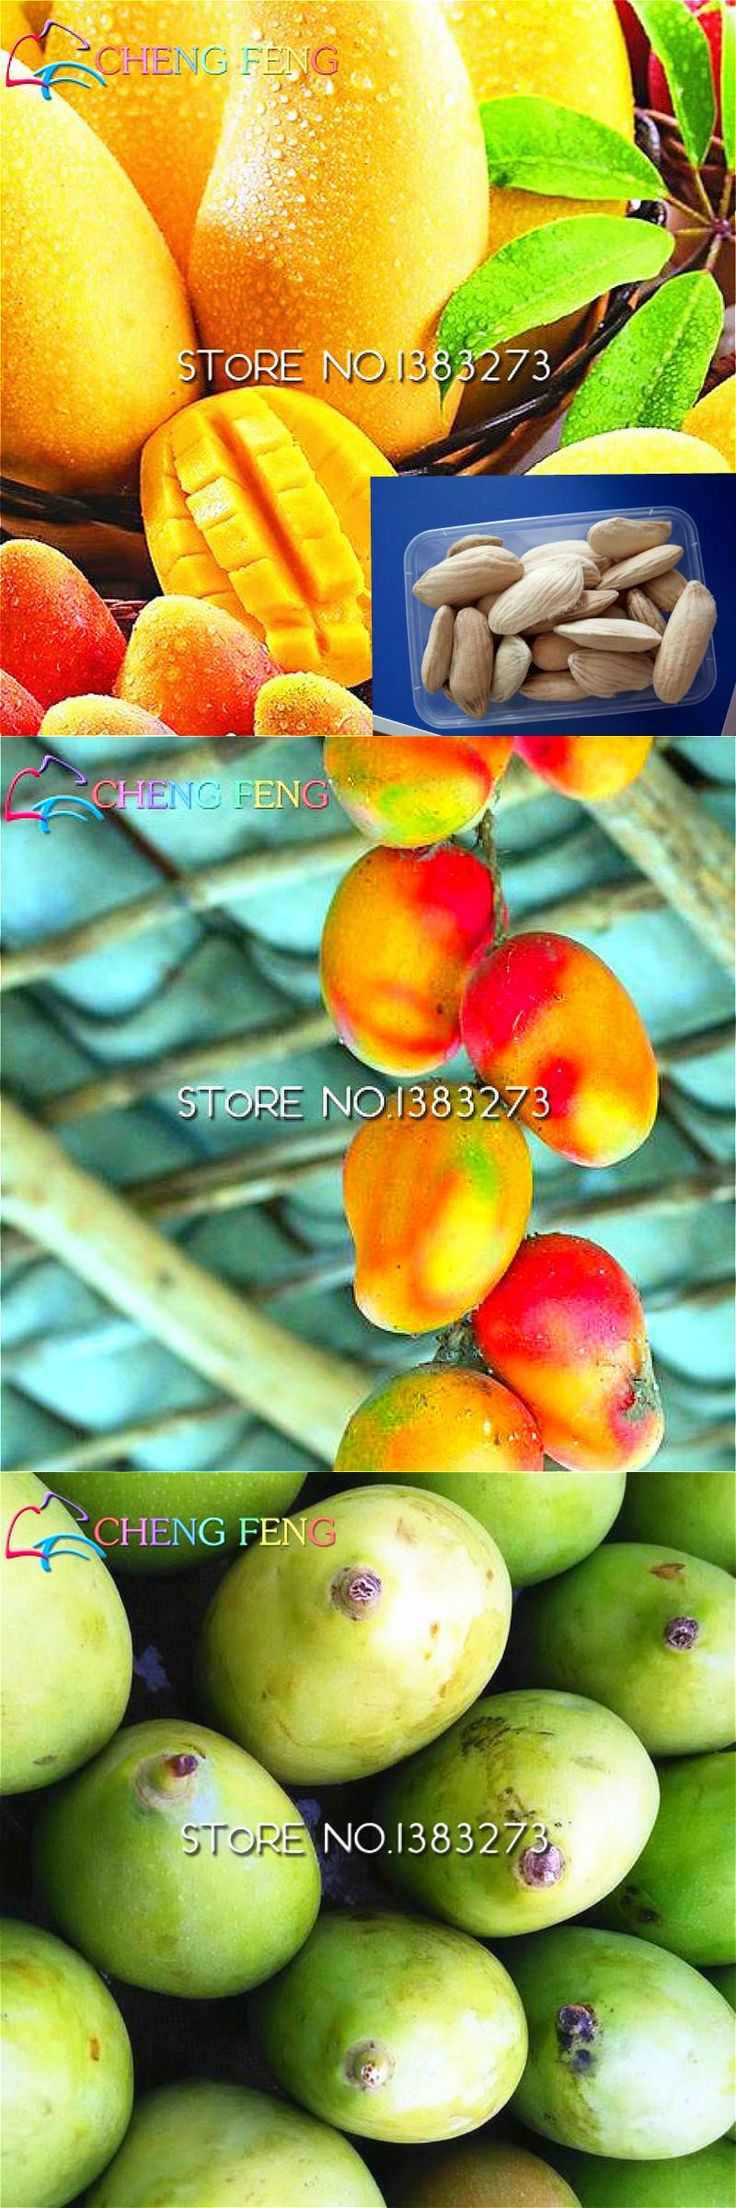 [Visit to Buy] Sale 1 Pcs/bag Giant And New Mango Seeds Mini Mango Tree Bonsai Seeds Organic Fruit Pot Diy Plant Seed For Home Garden Sementes #Advertisement